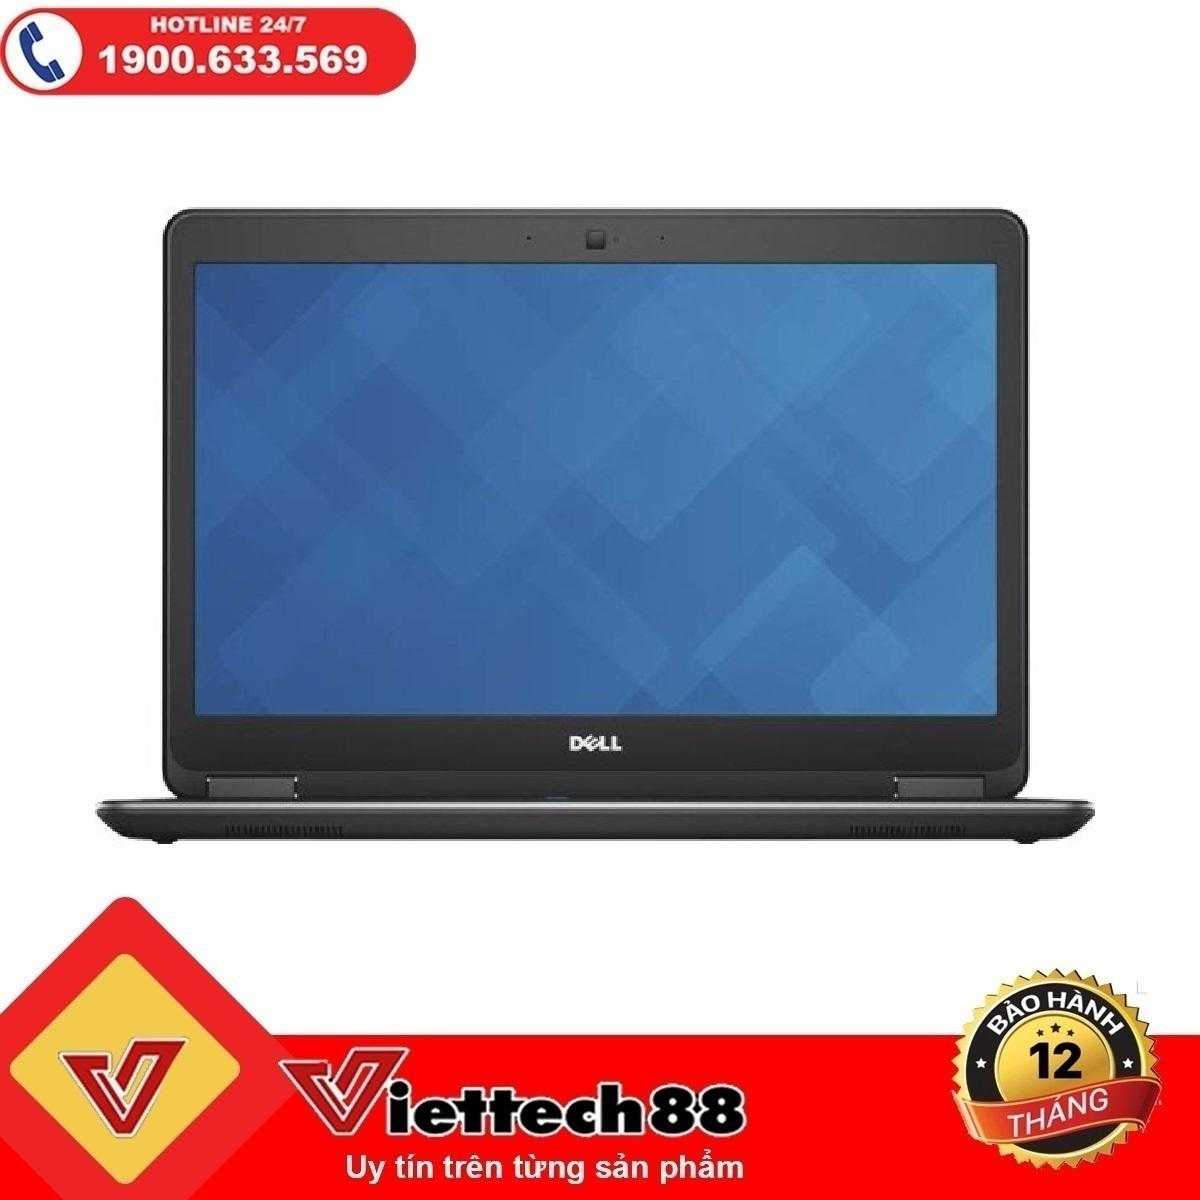 Offer Khuyến Mãi DELL LATITUDE E7440 I5-4310U / 4GB RAM/ 128GB SSD/ VGA 14 INCH FULL HD